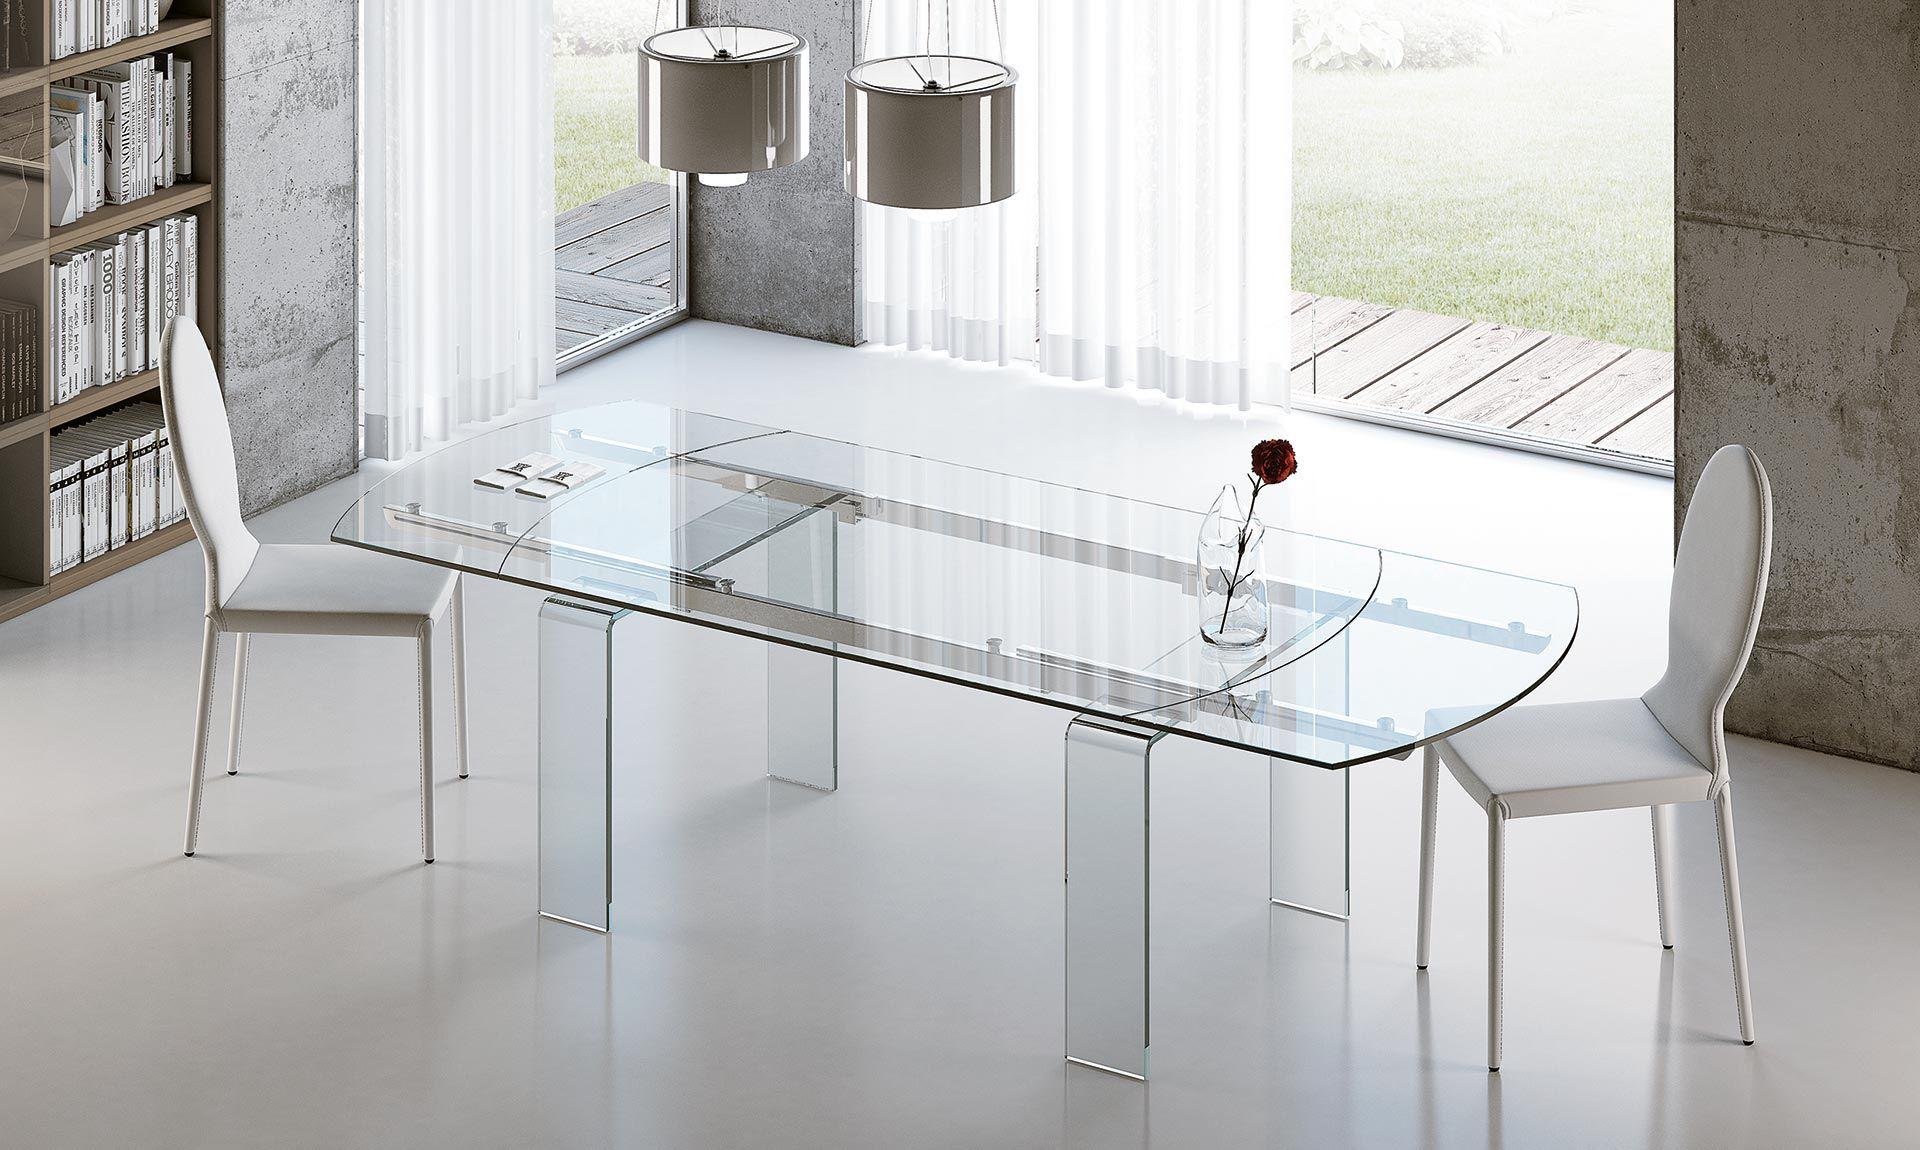 Tavolo ovale in vetro Lord Riflessi | Tavoli da Pranzo | Pinterest ...